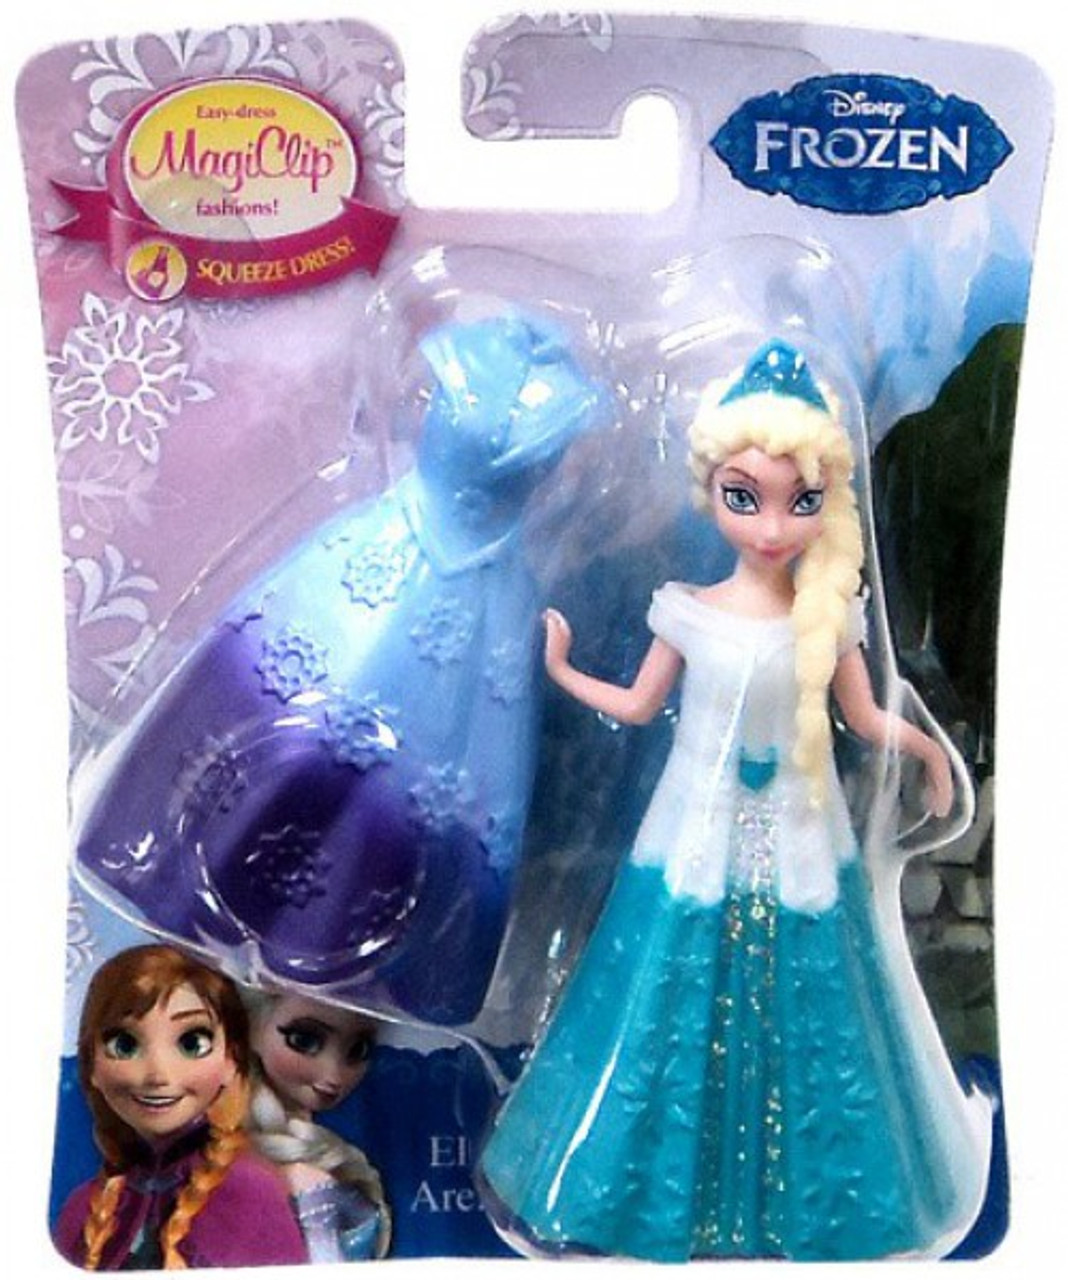 Disney Frozen Elsa of Arendelle 3.75-Inch Figure